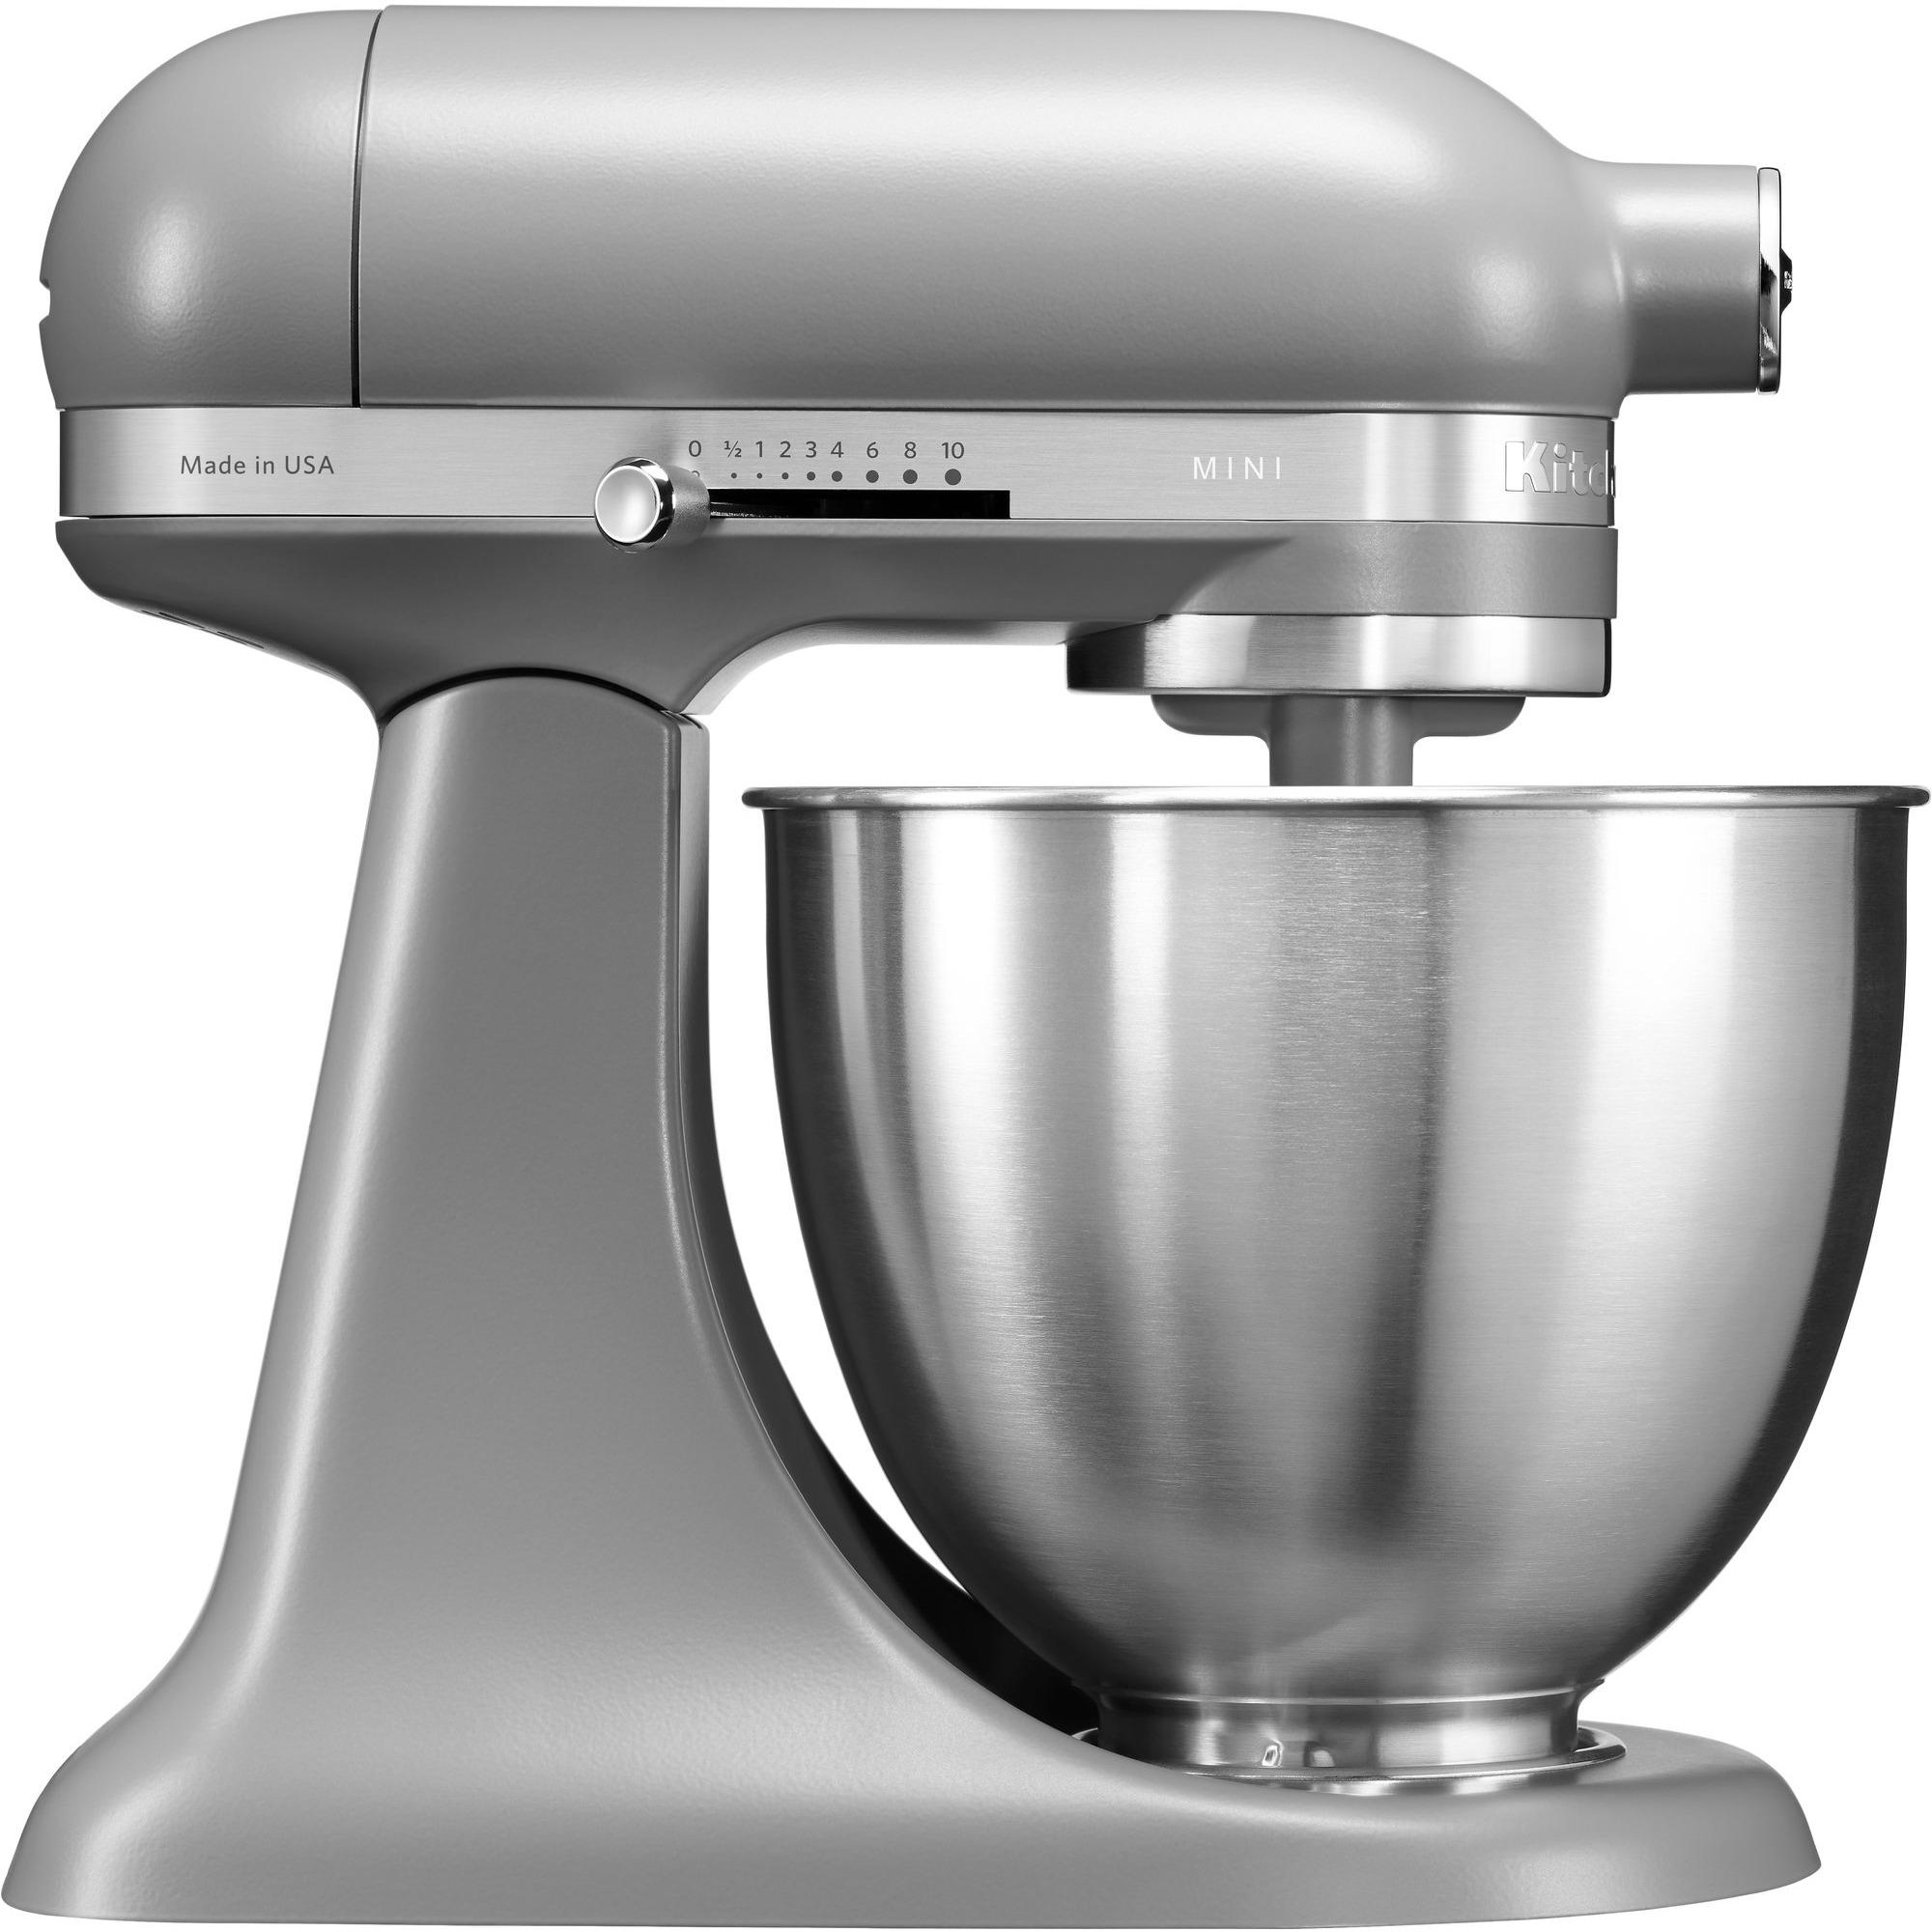 KitchenAid Artisan Stand Mixer Mini 33 L Grey Matte